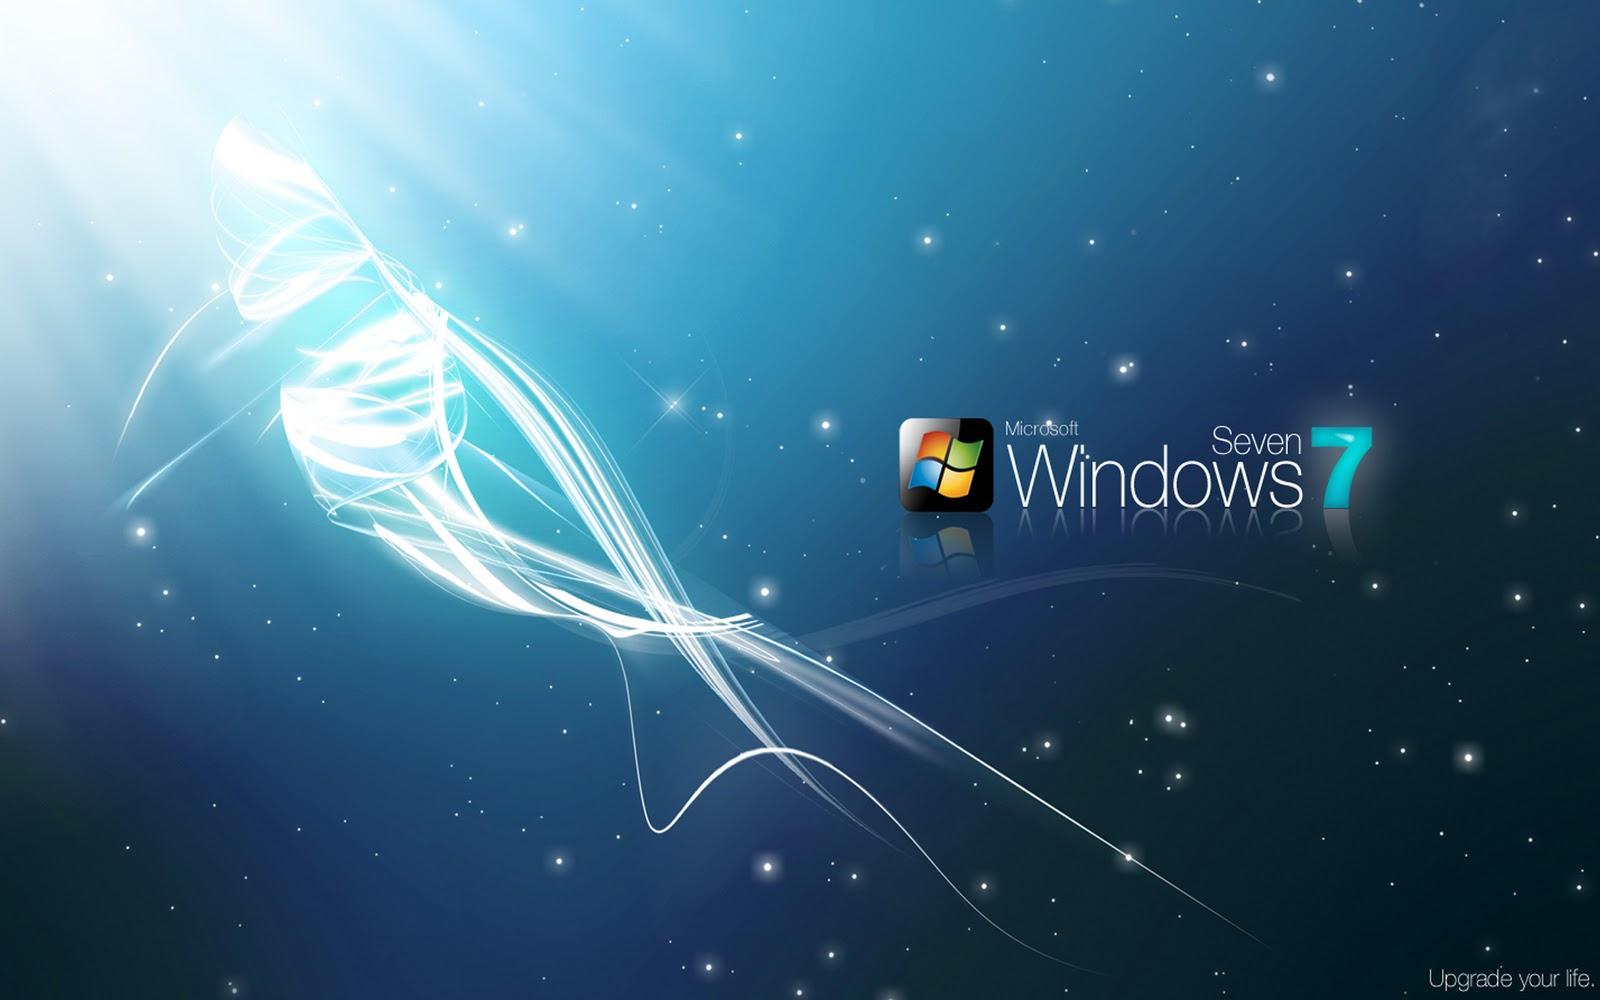 http://3.bp.blogspot.com/-KHhWFCteCcw/ToPhPJ54wnI/AAAAAAAAAAM/CqMRBjk2F3o/s1600/Windows+7+ultimate+collection+of+wallpapers+%2528guwahatilive+%25281%2529.jpeg